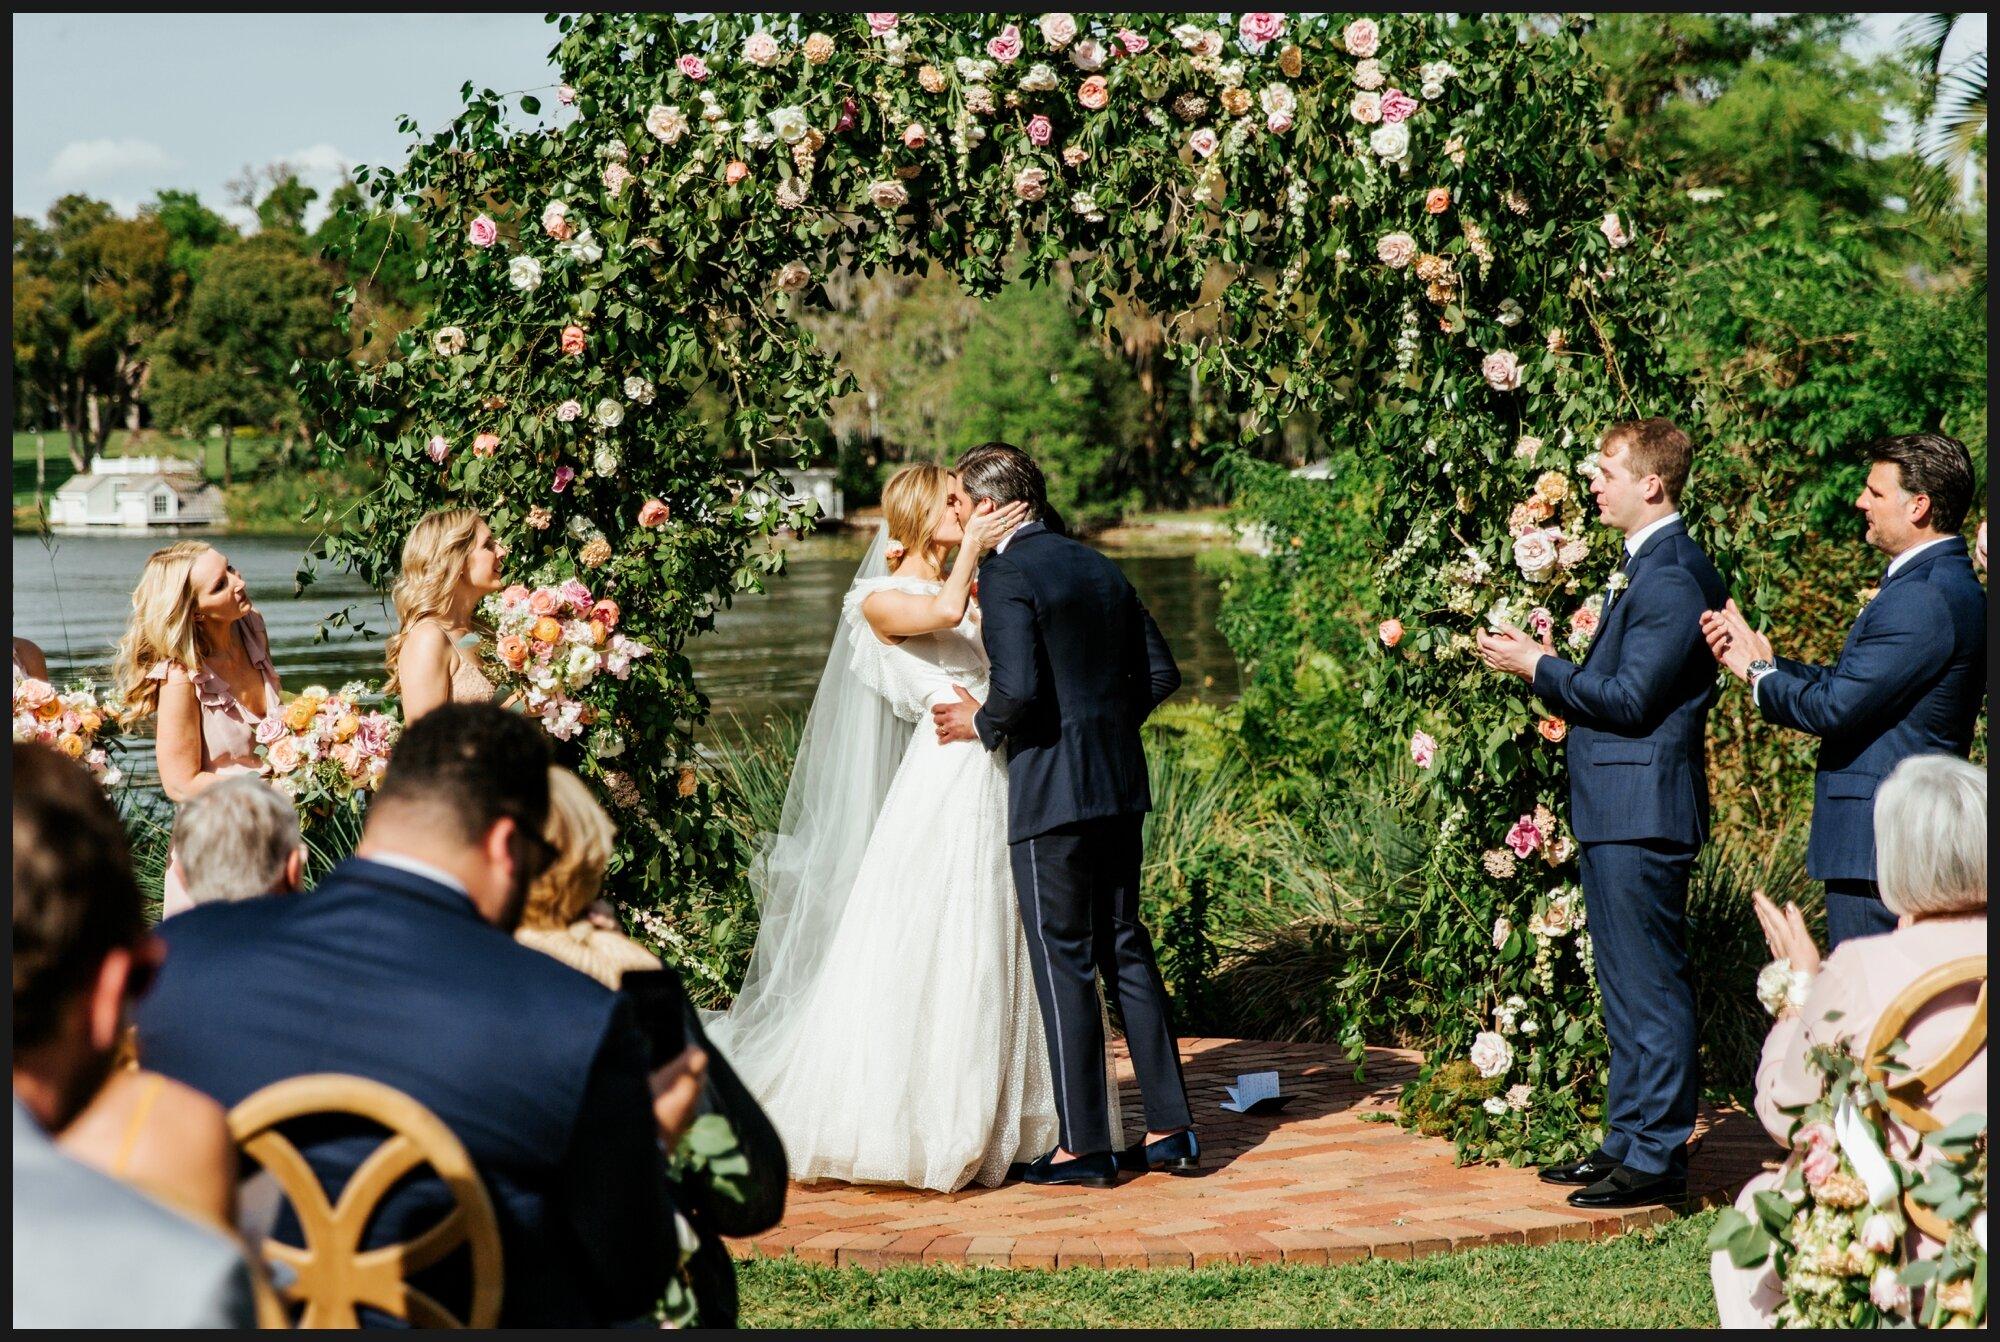 Orlando-Wedding-Photographer-destination-wedding-photographer-florida-wedding-photographer-hawaii-wedding-photographer_0755.jpg